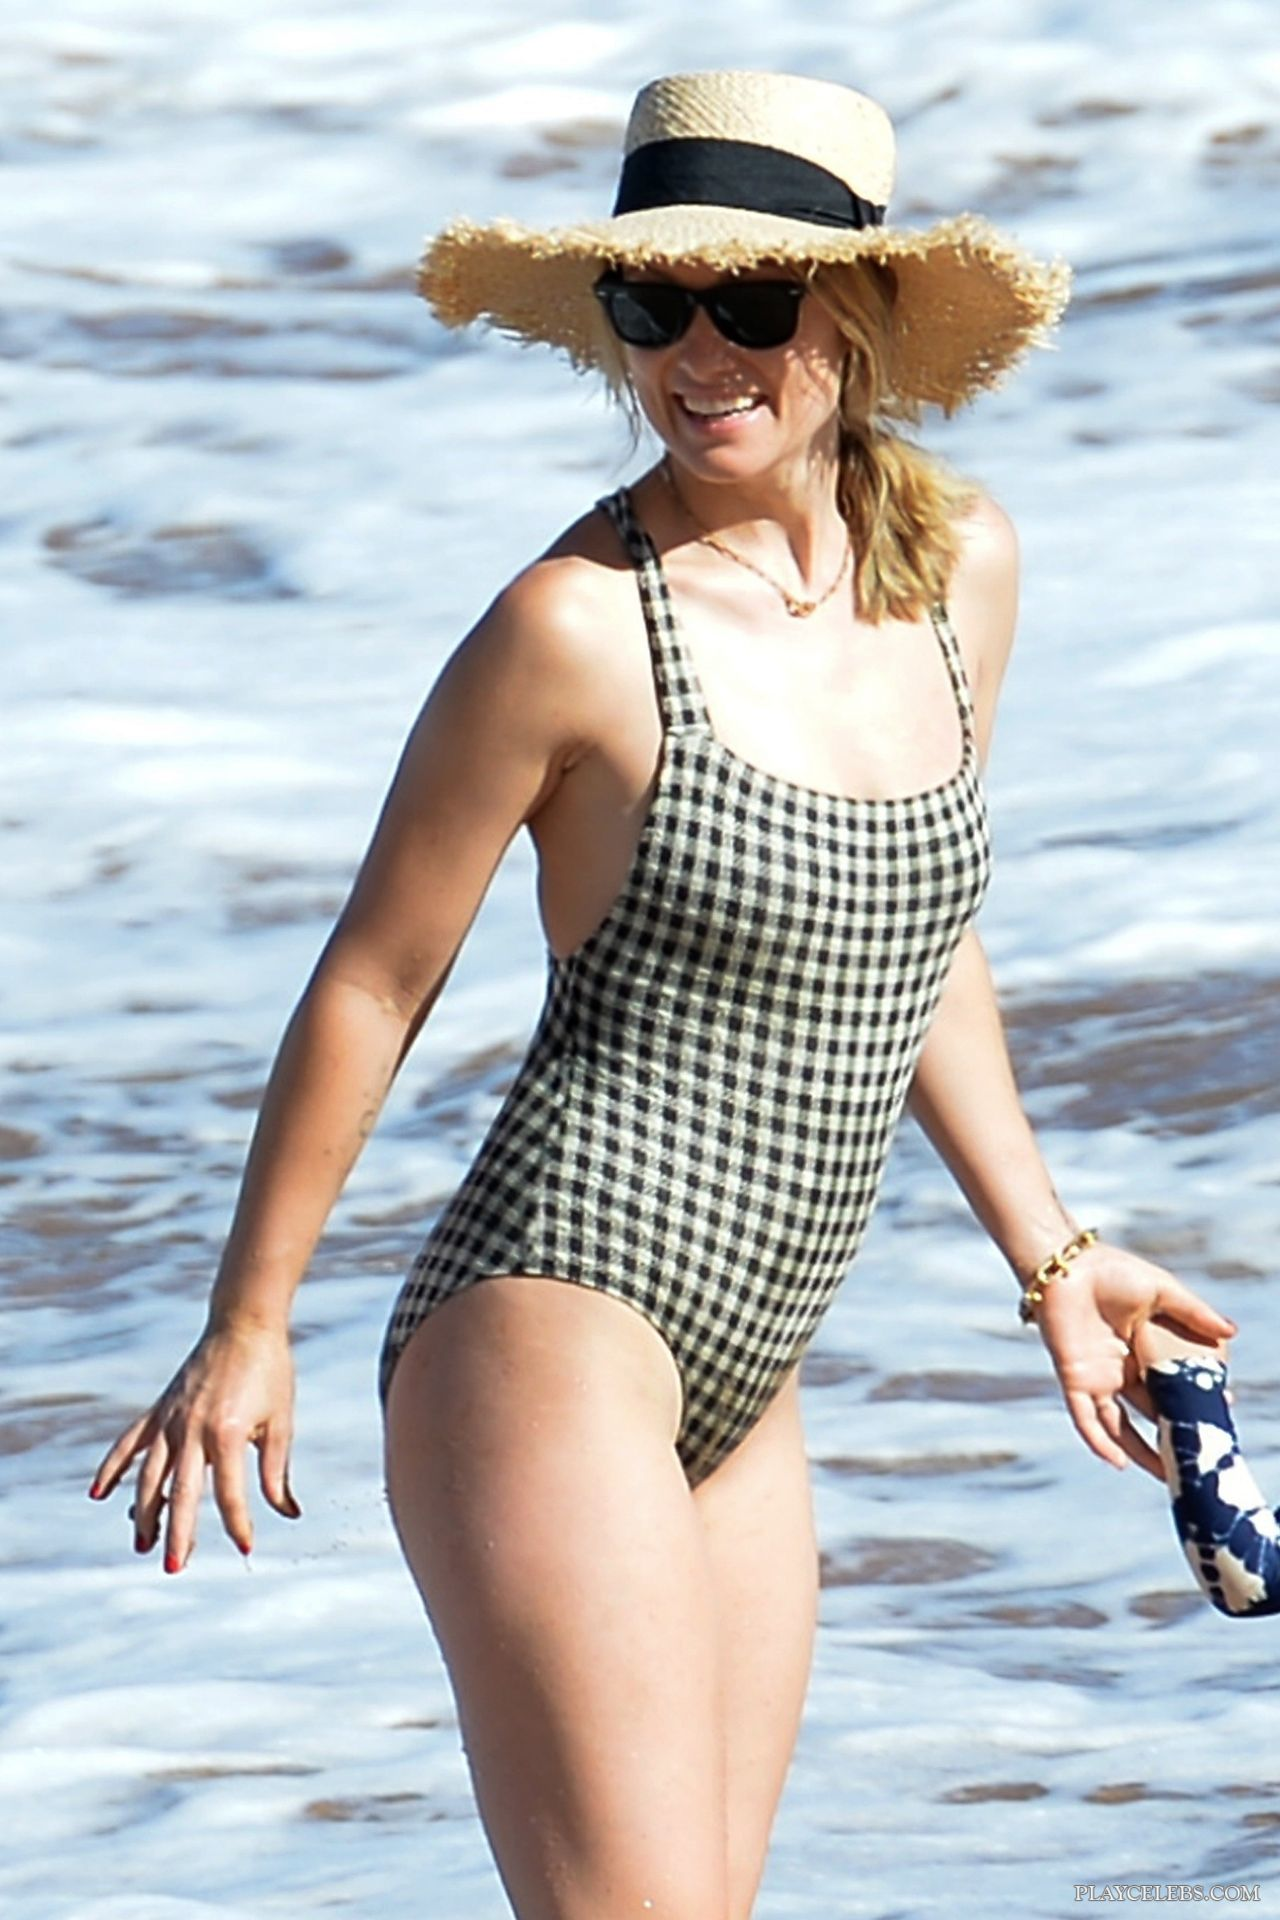 Olivia Wilde Paparazzi Swimsuit Beach Pictures